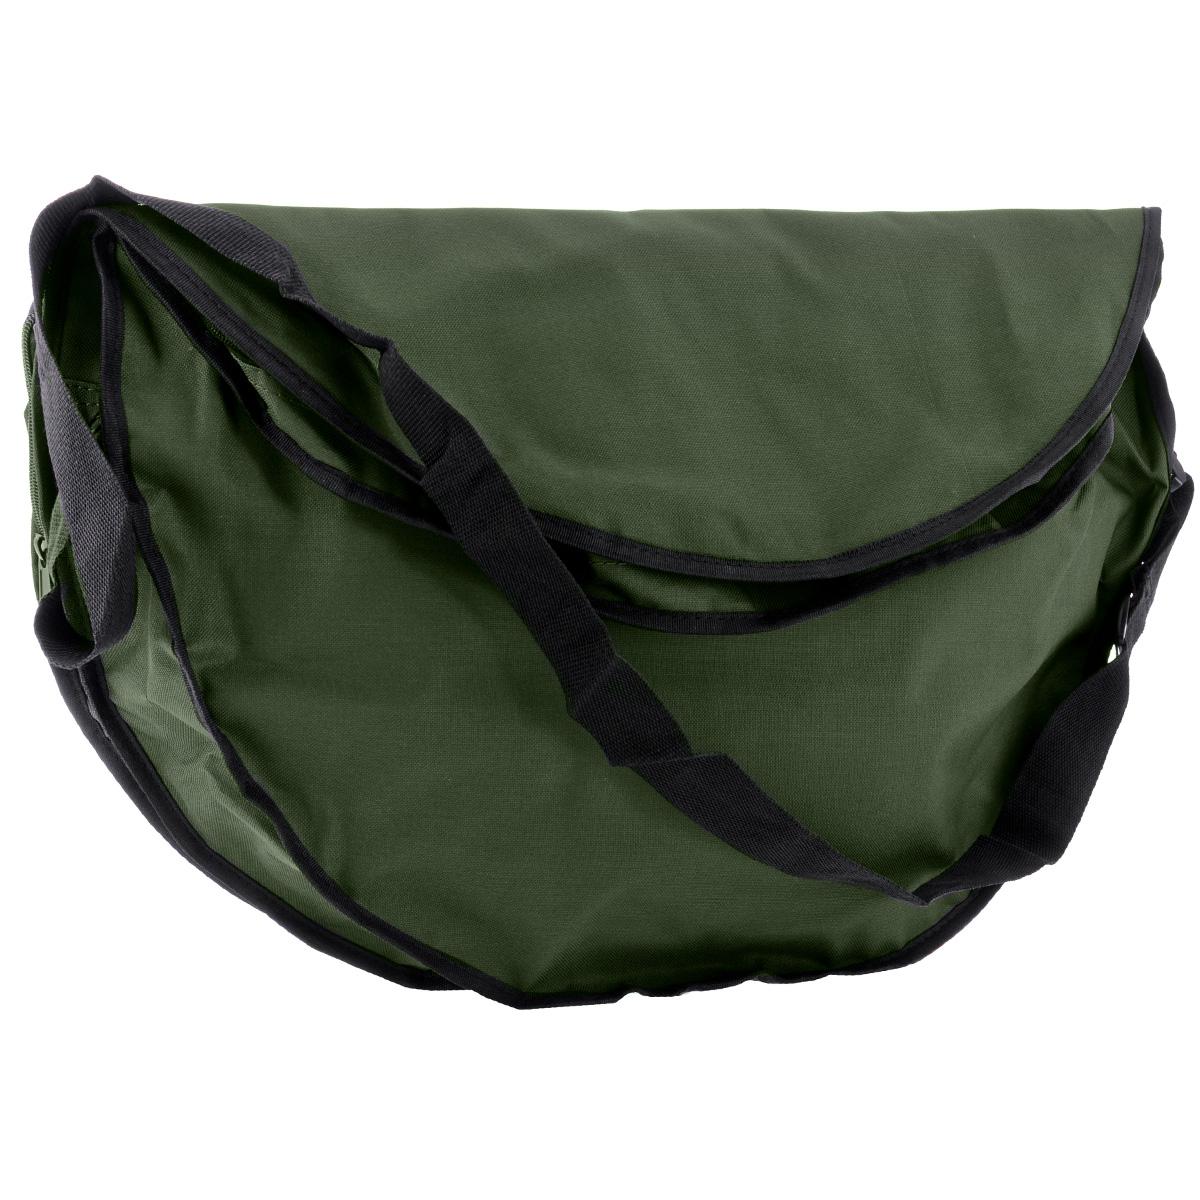 "Чехол для садка ""Salmo"", цвет: зеленый, 62 см х 62 см х 17 см"